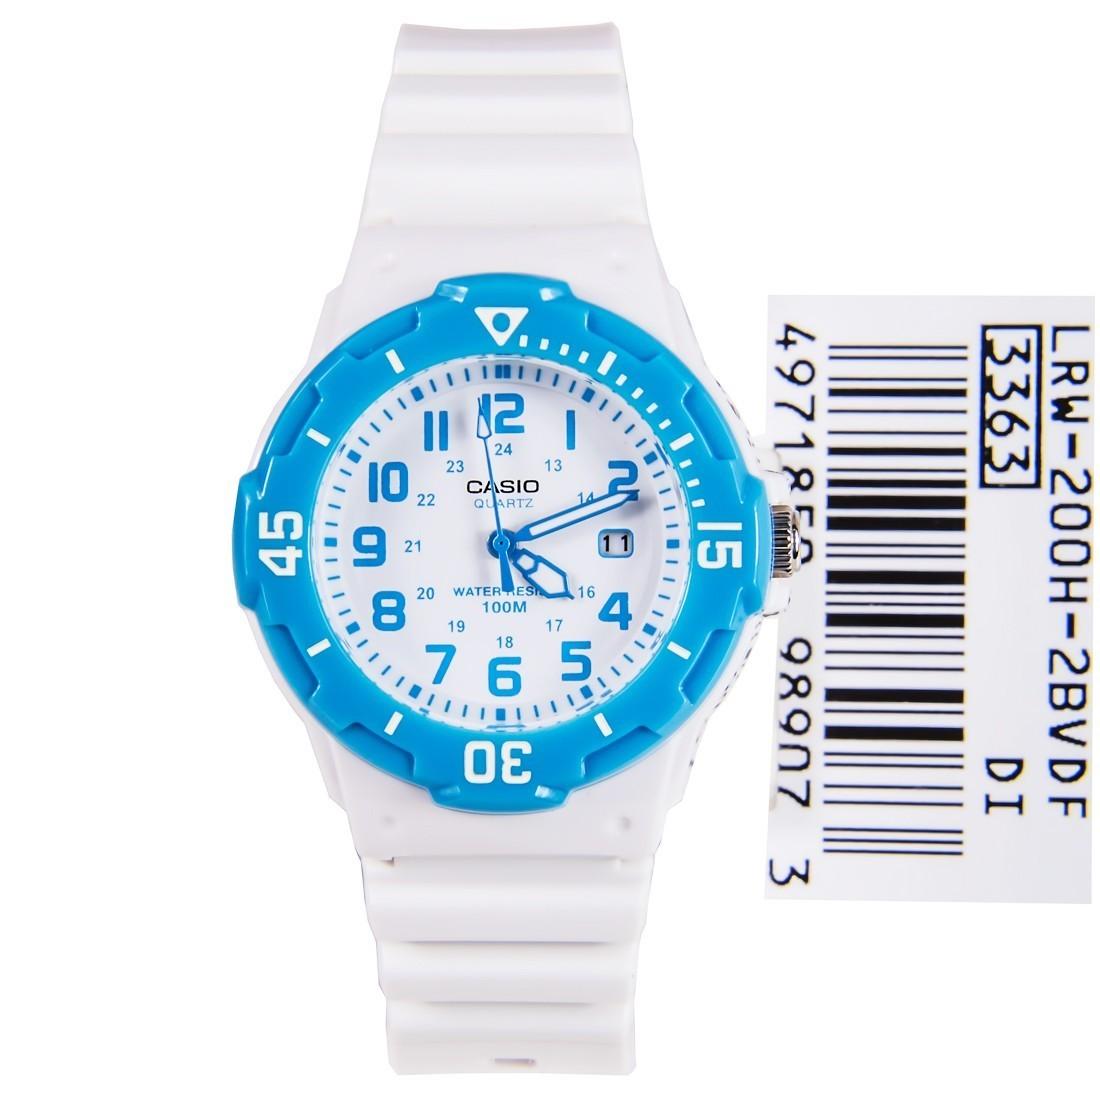 Reloj CASIO mujer analogico LRW-200H-2b